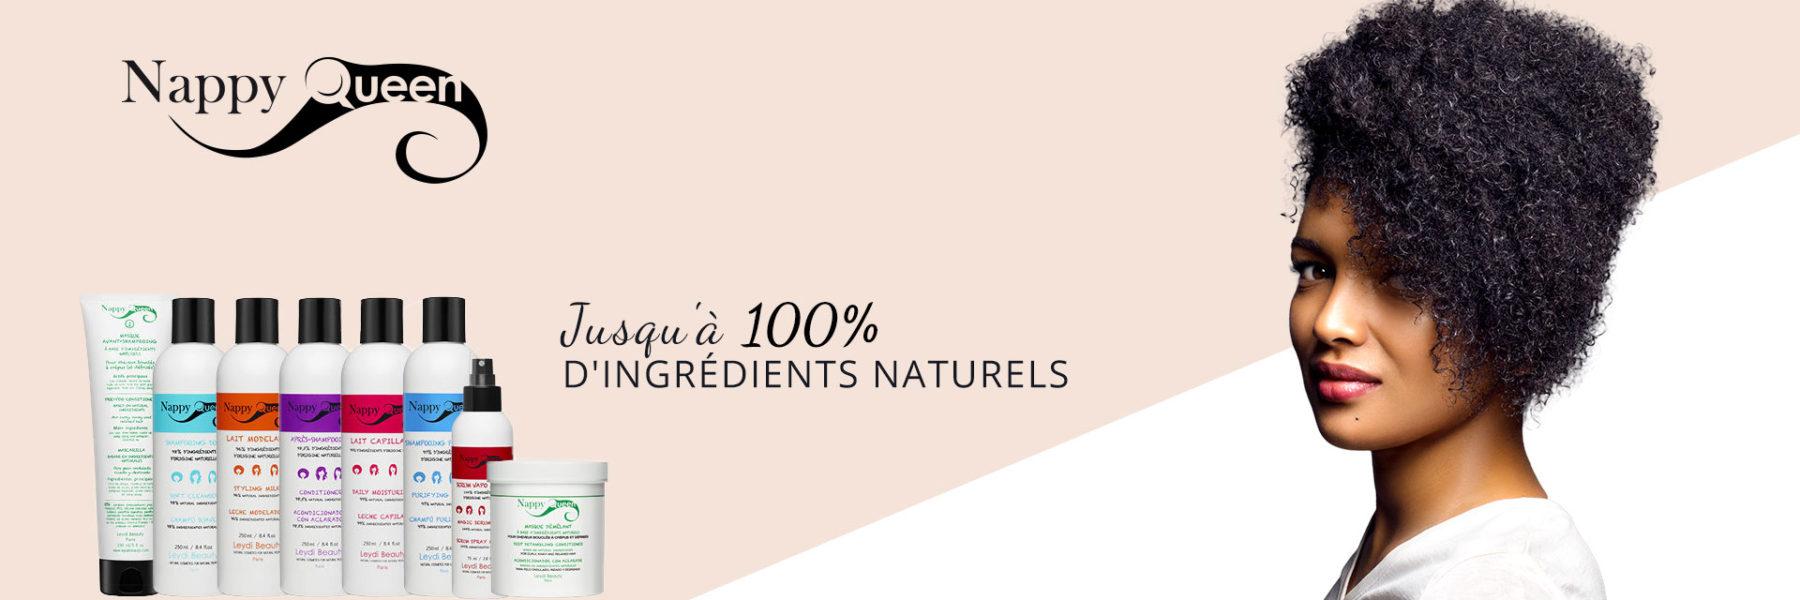 nappyQueen soins naturels cheveux